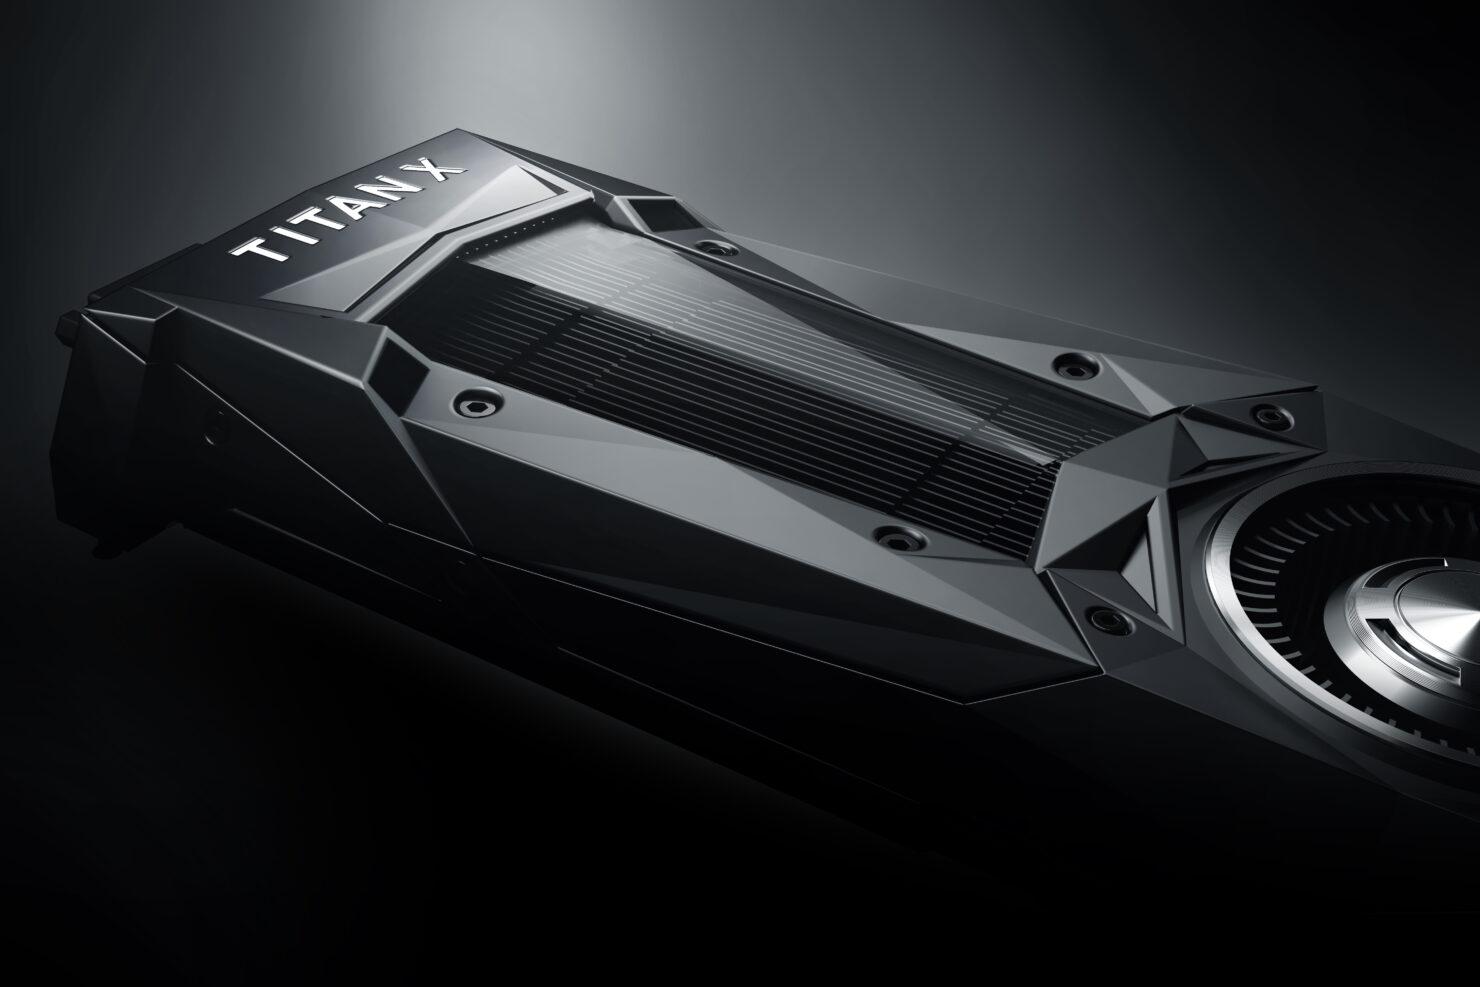 nvidia-titan-x-graphics-card_3